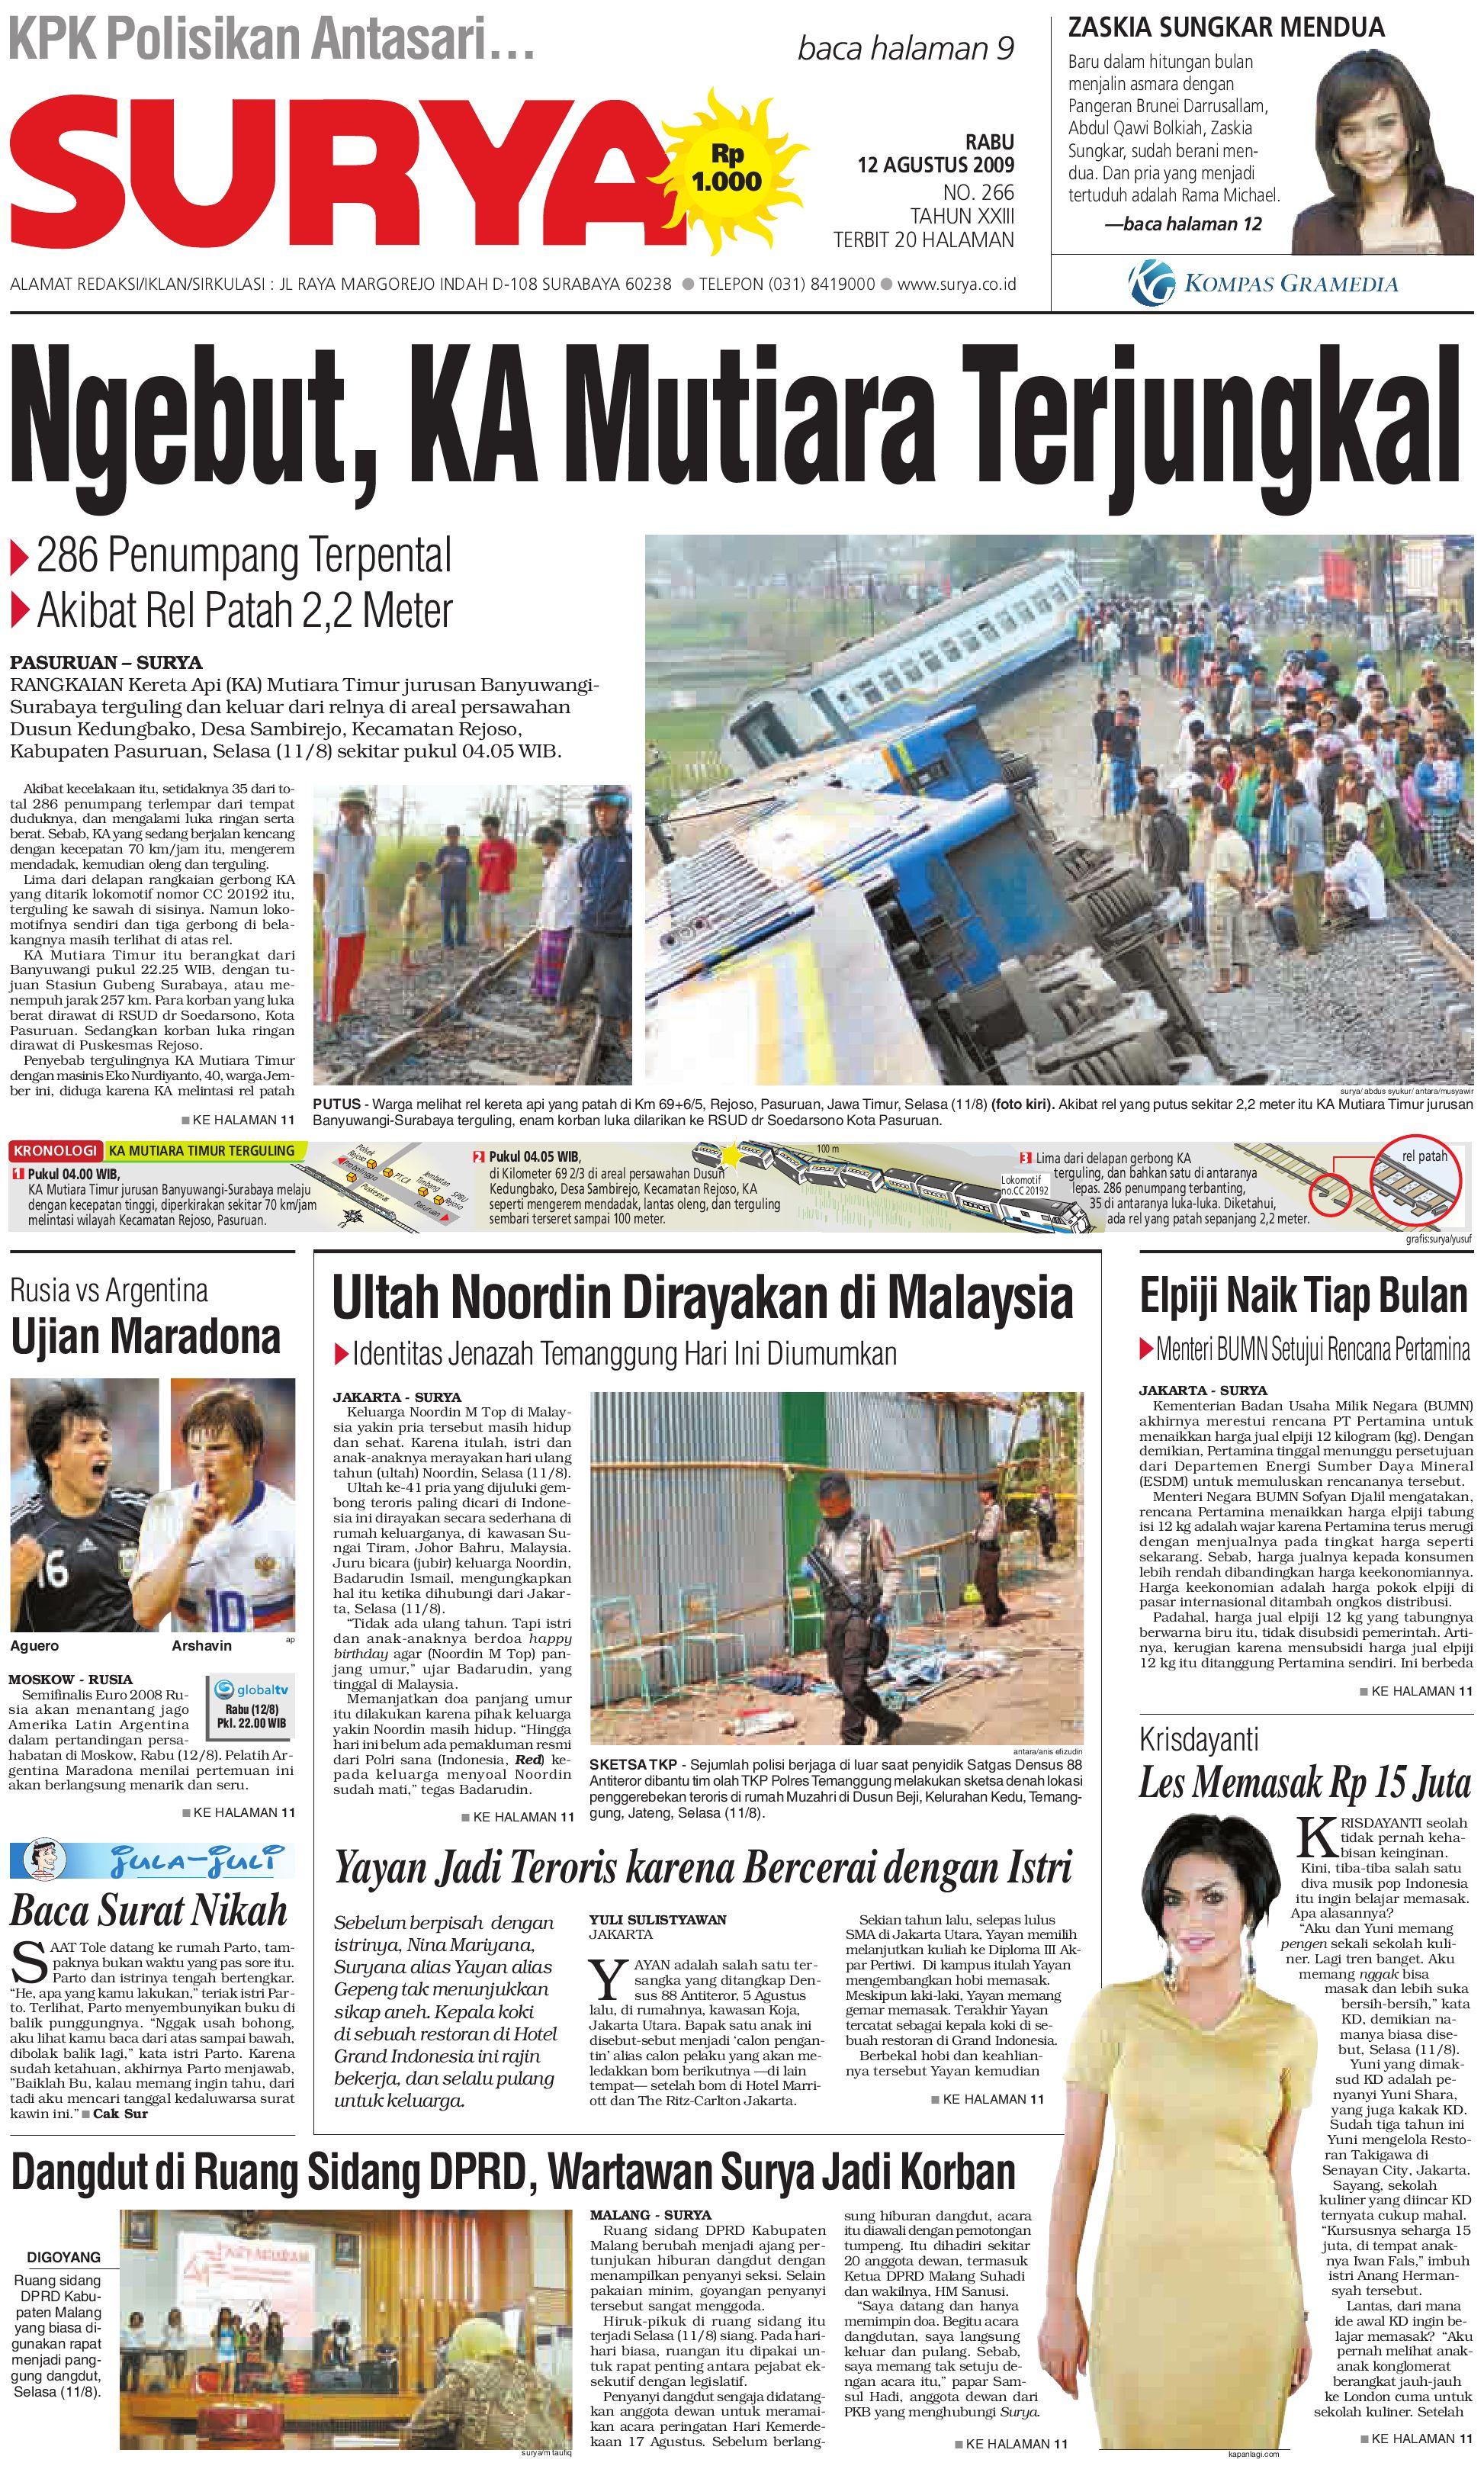 Surya Edisi Cetak 12 Agt 2009 By Harian Issuu Produk Ukm Bumn Tas Phiton Kembang Orchid